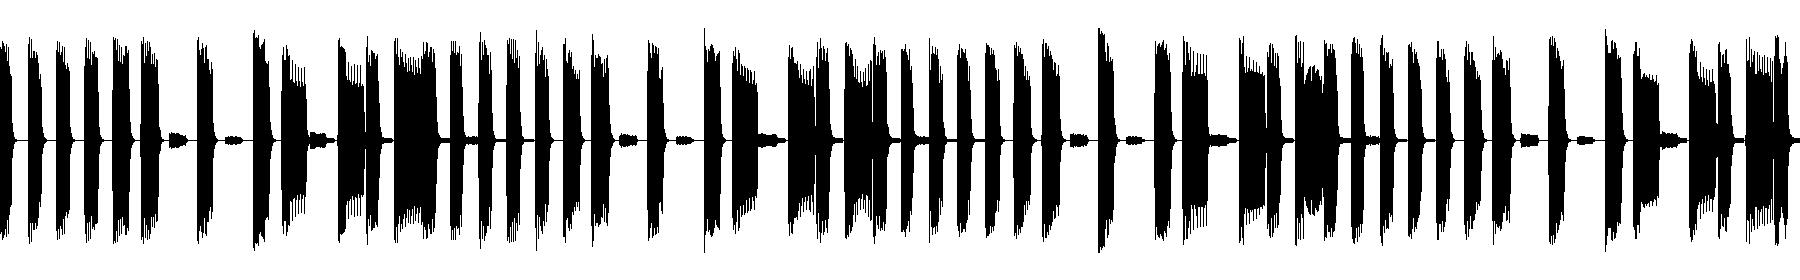 seq1 145